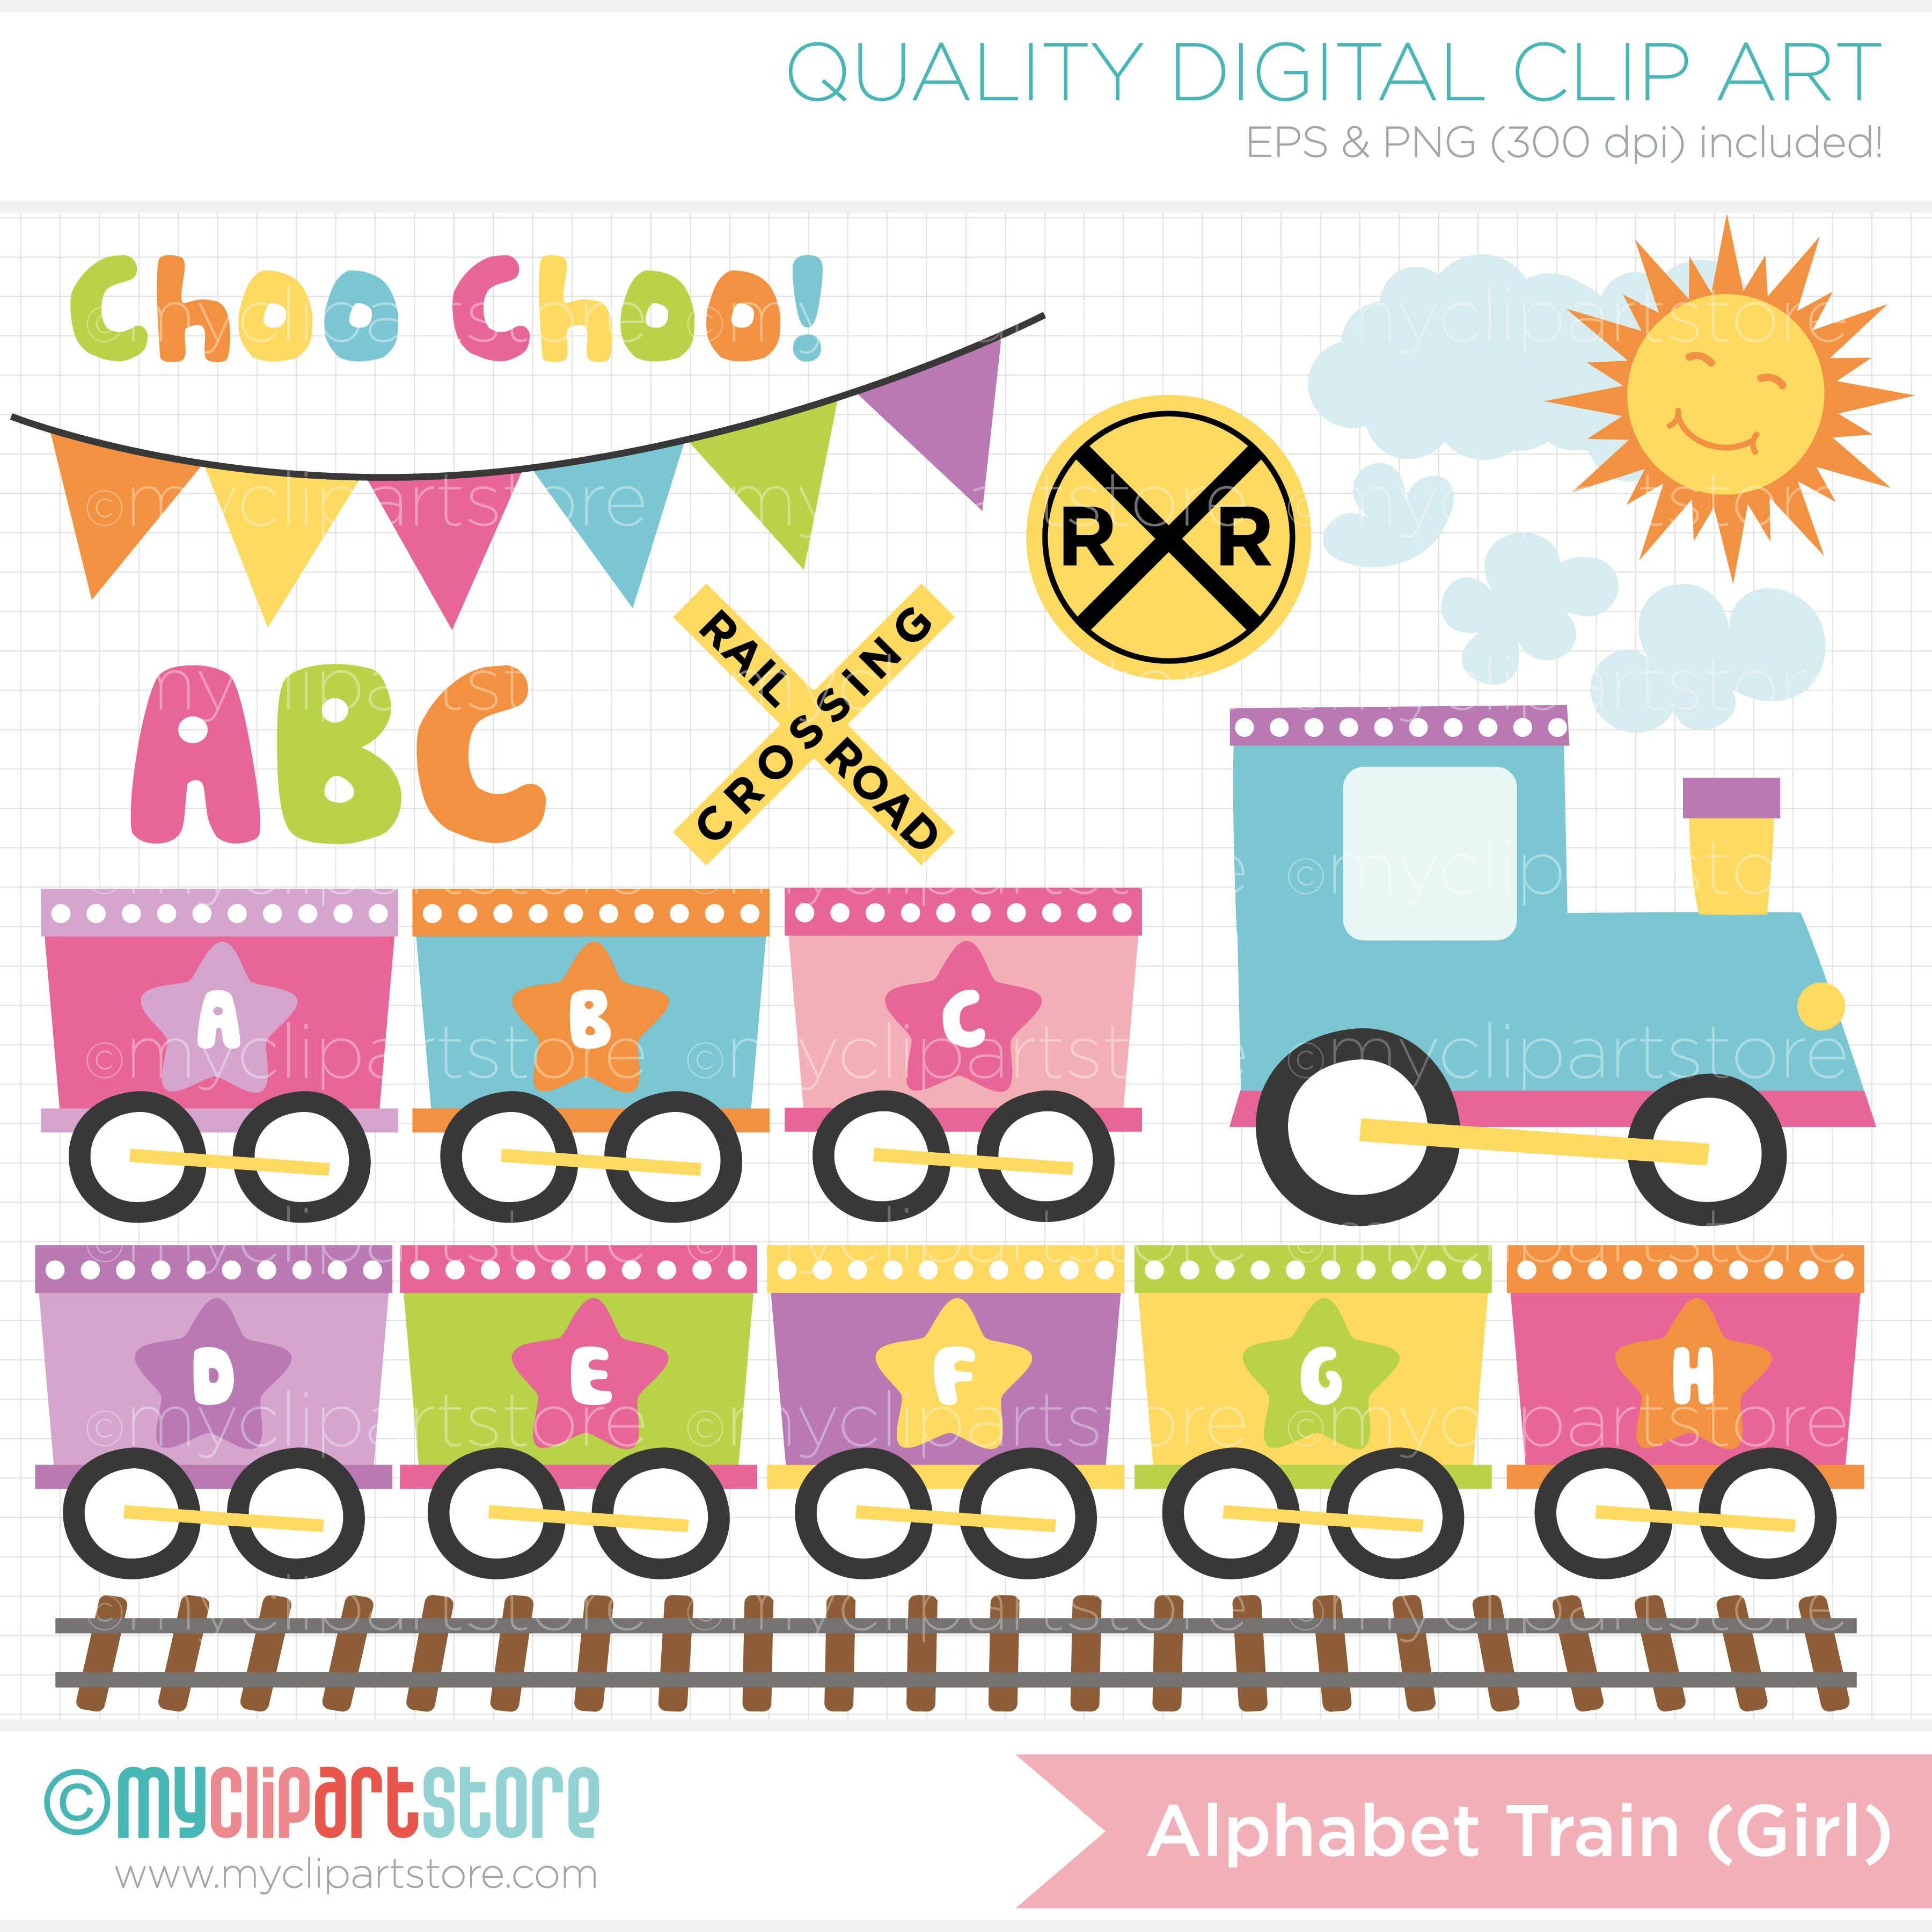 Alphabet train coloring - Baby Girl Choo Choo Train Abc Alphabet Train Clipart